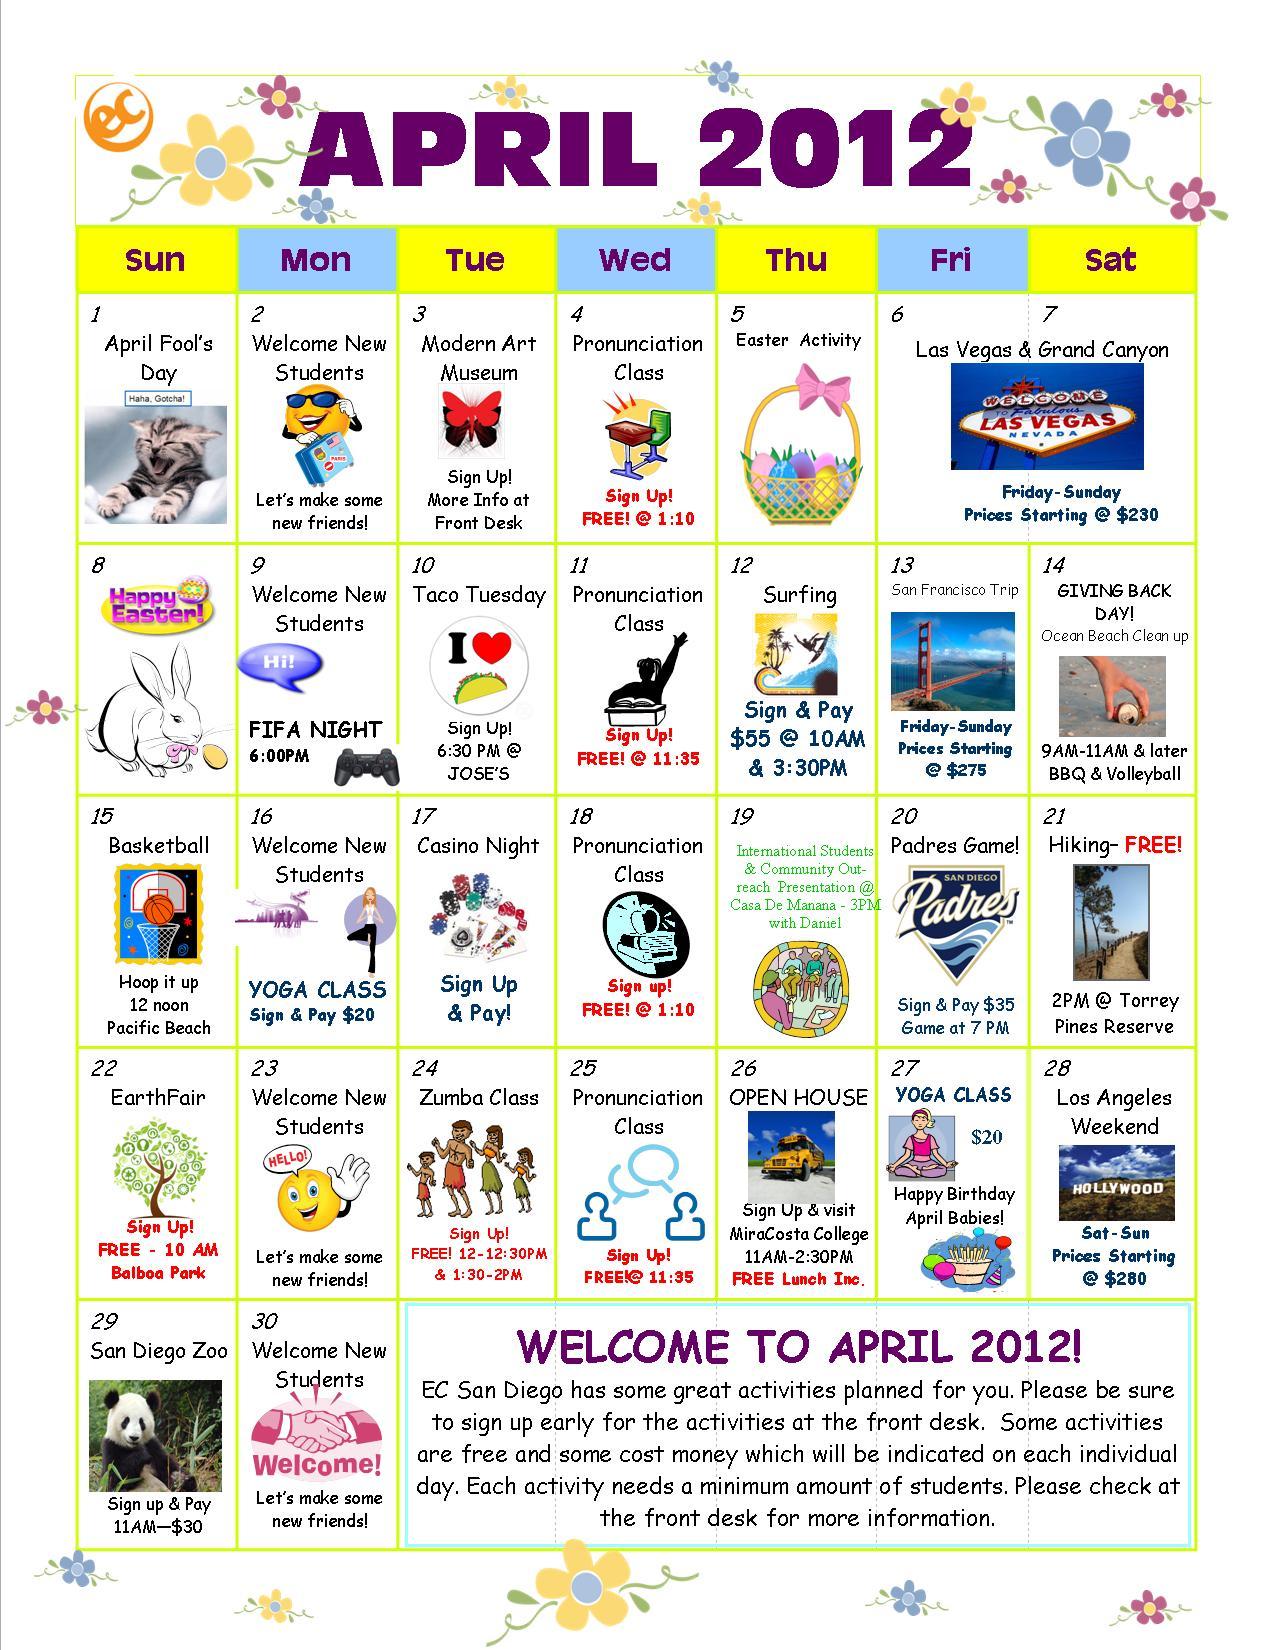 April Activity Calendar is here! - EC San Diego Blog